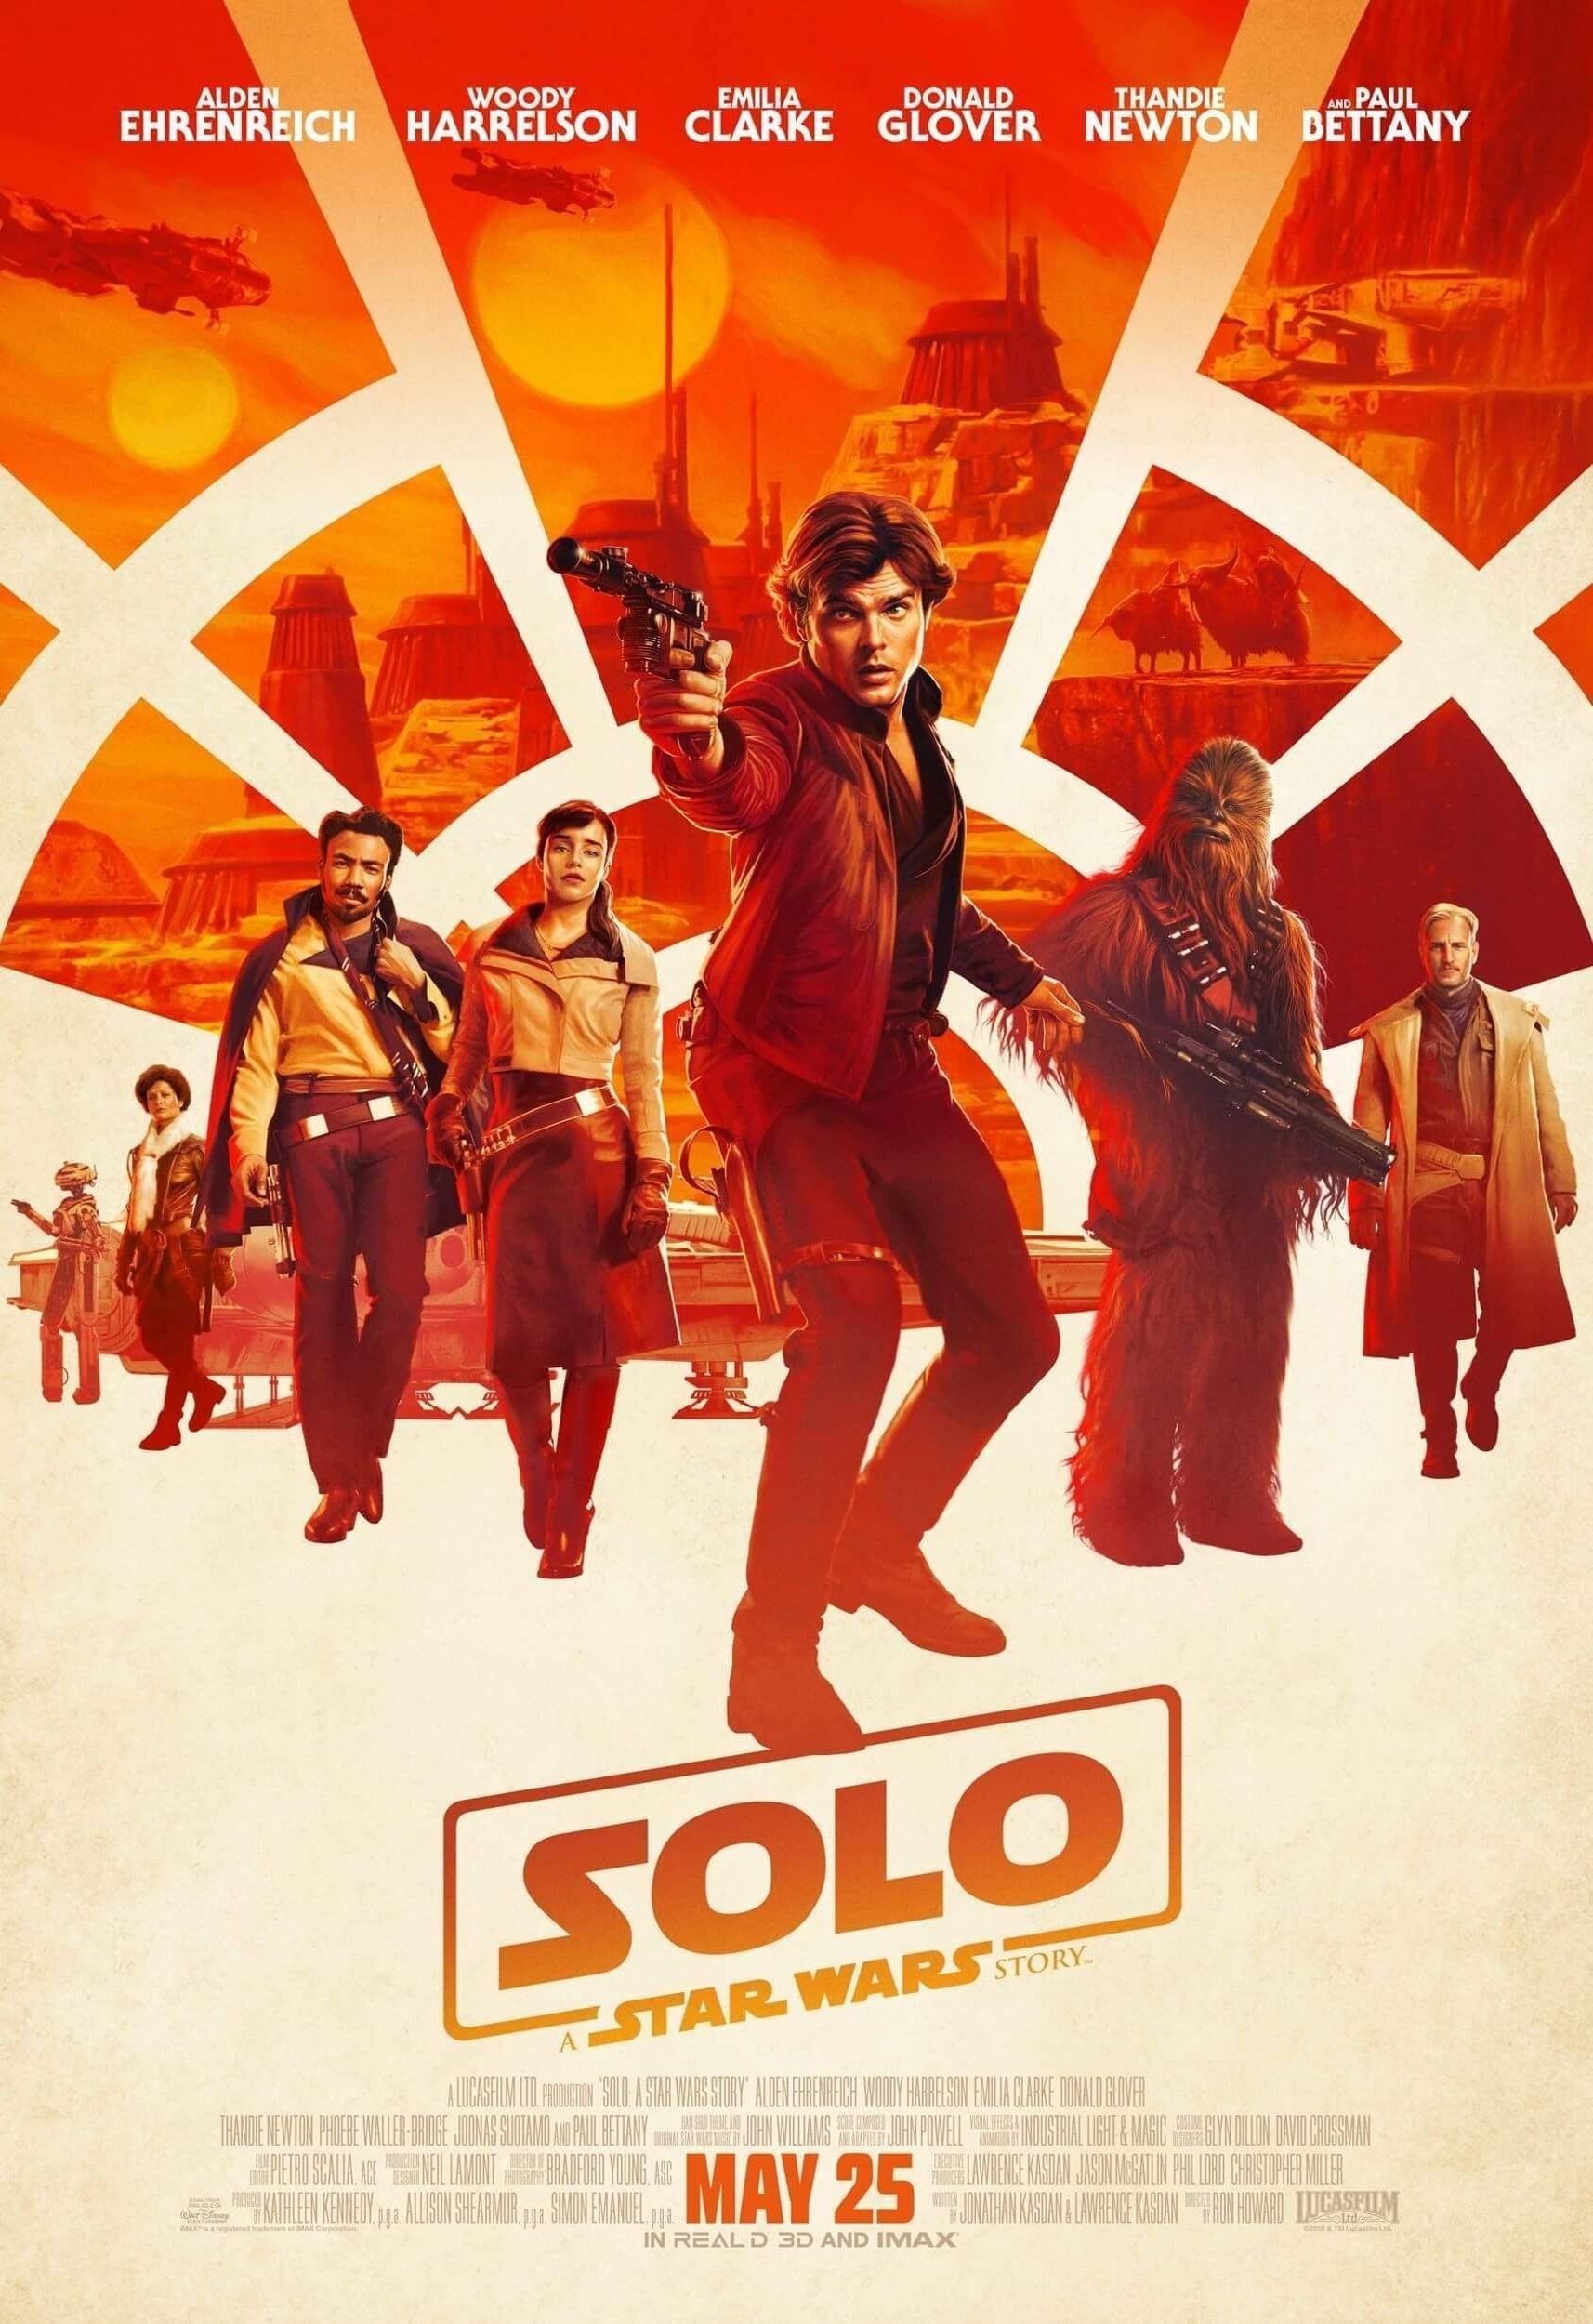 Solo A Star Wars Story 2018 720p BluRay x264-x0r